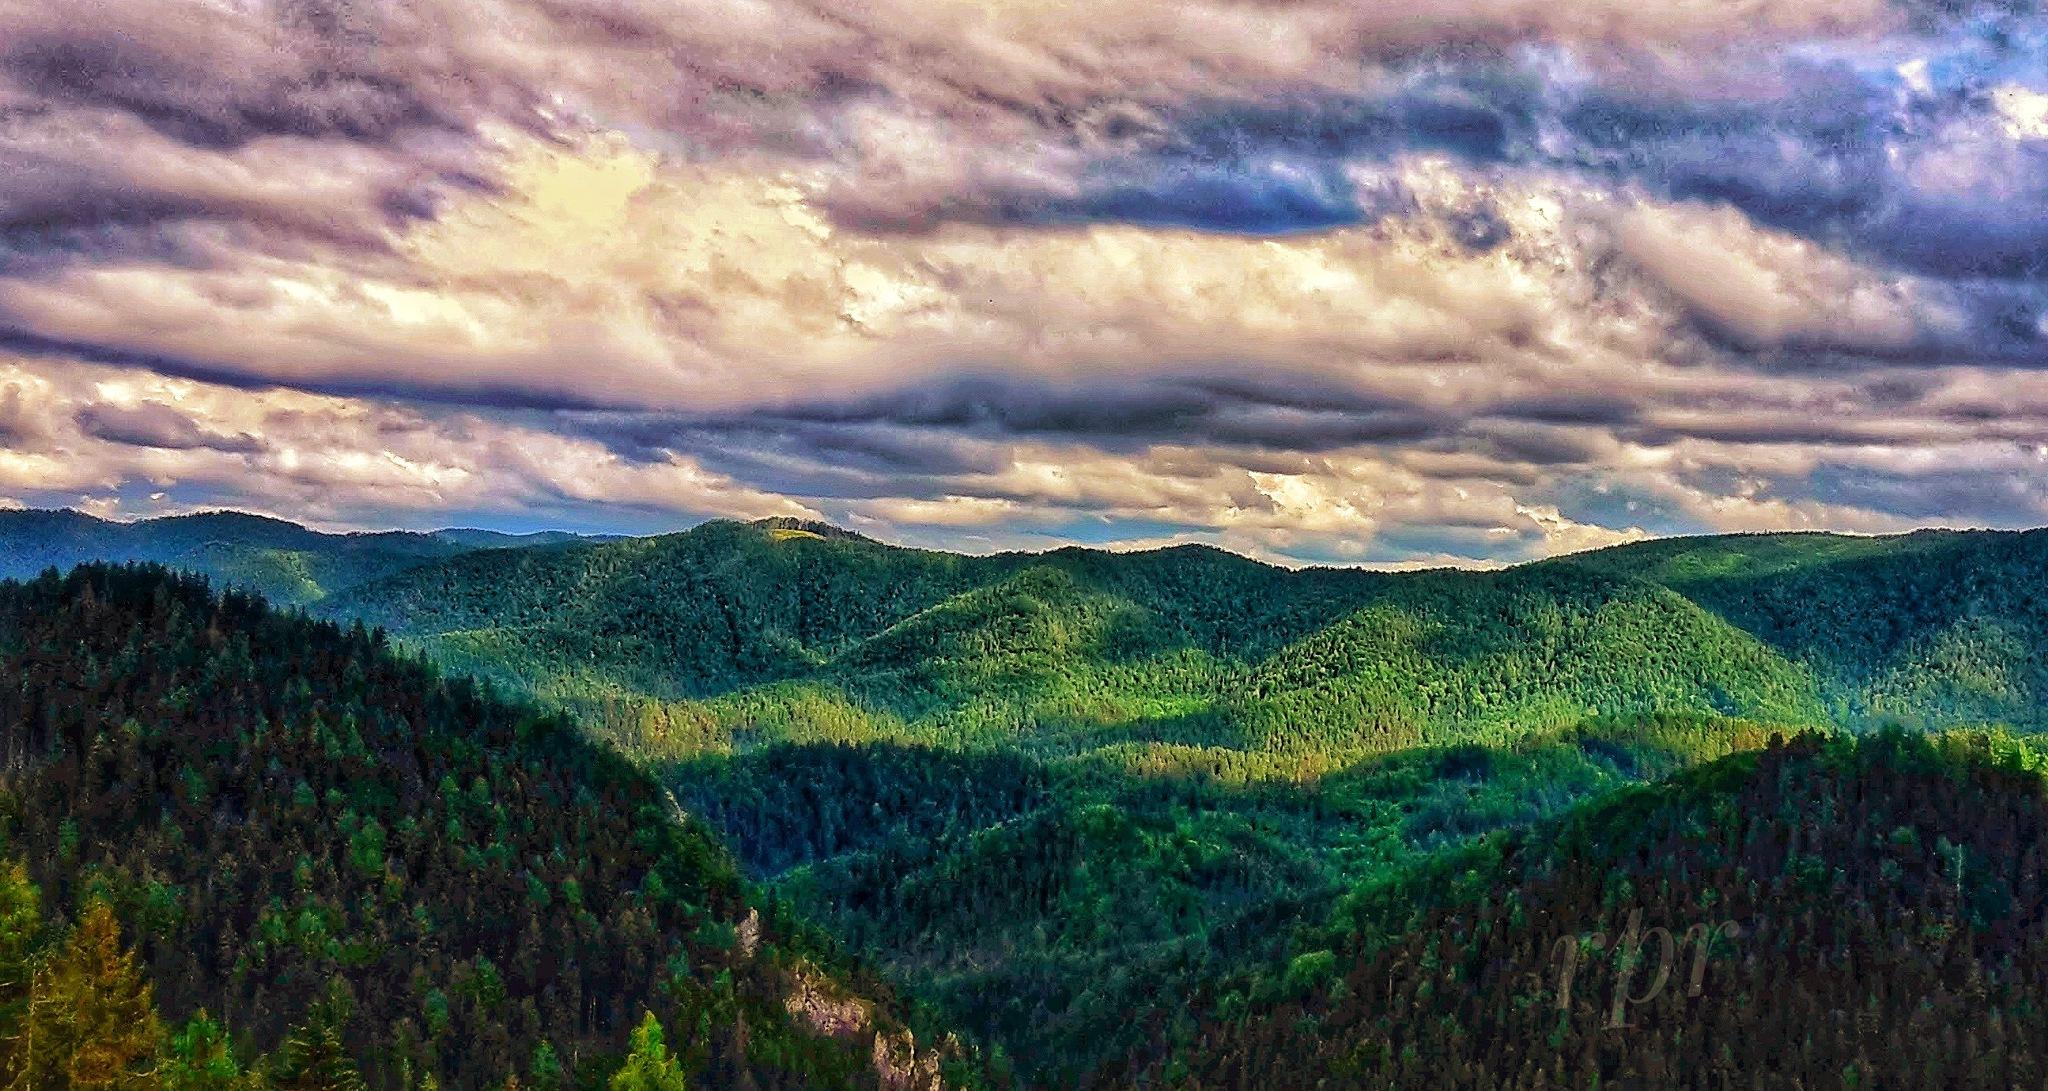 Landscape  by  robert pojedinec robert